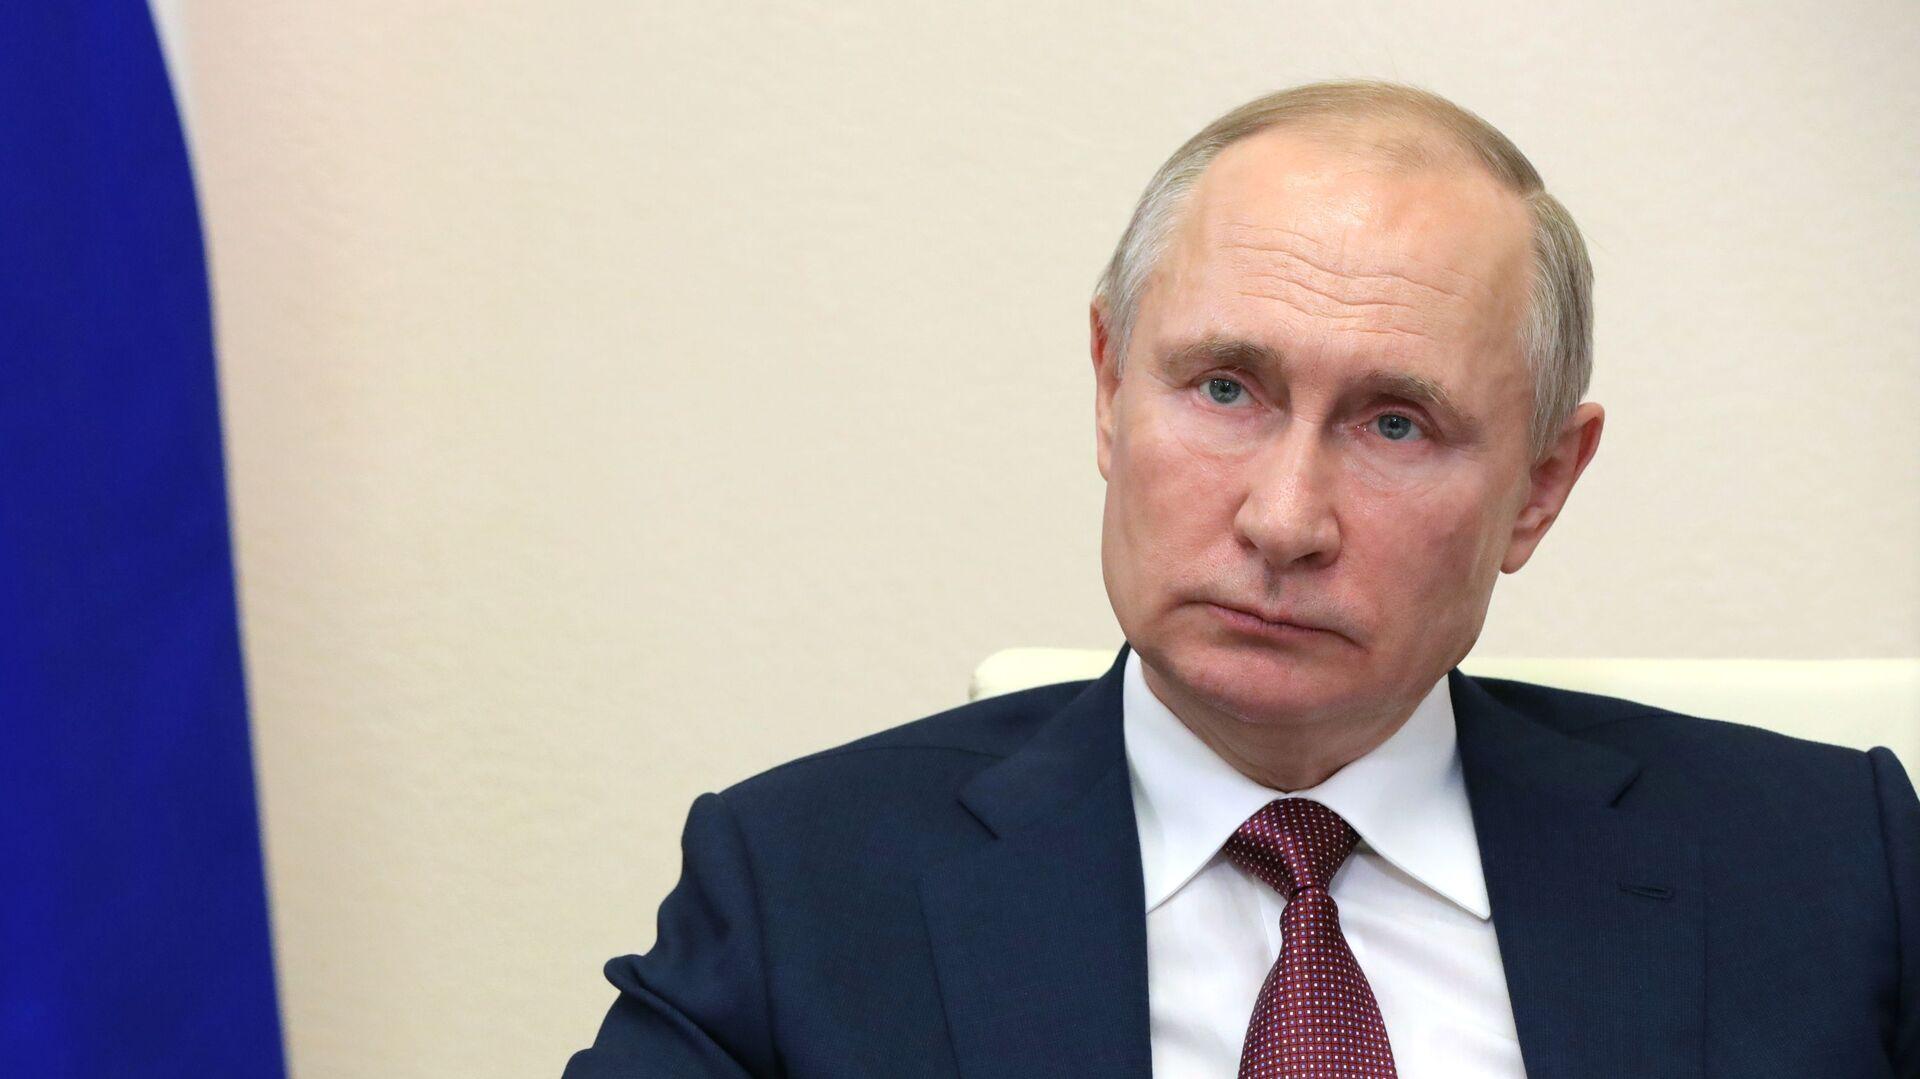 Vladímir Putin, presidente de Rusia - Sputnik Mundo, 1920, 10.02.2021